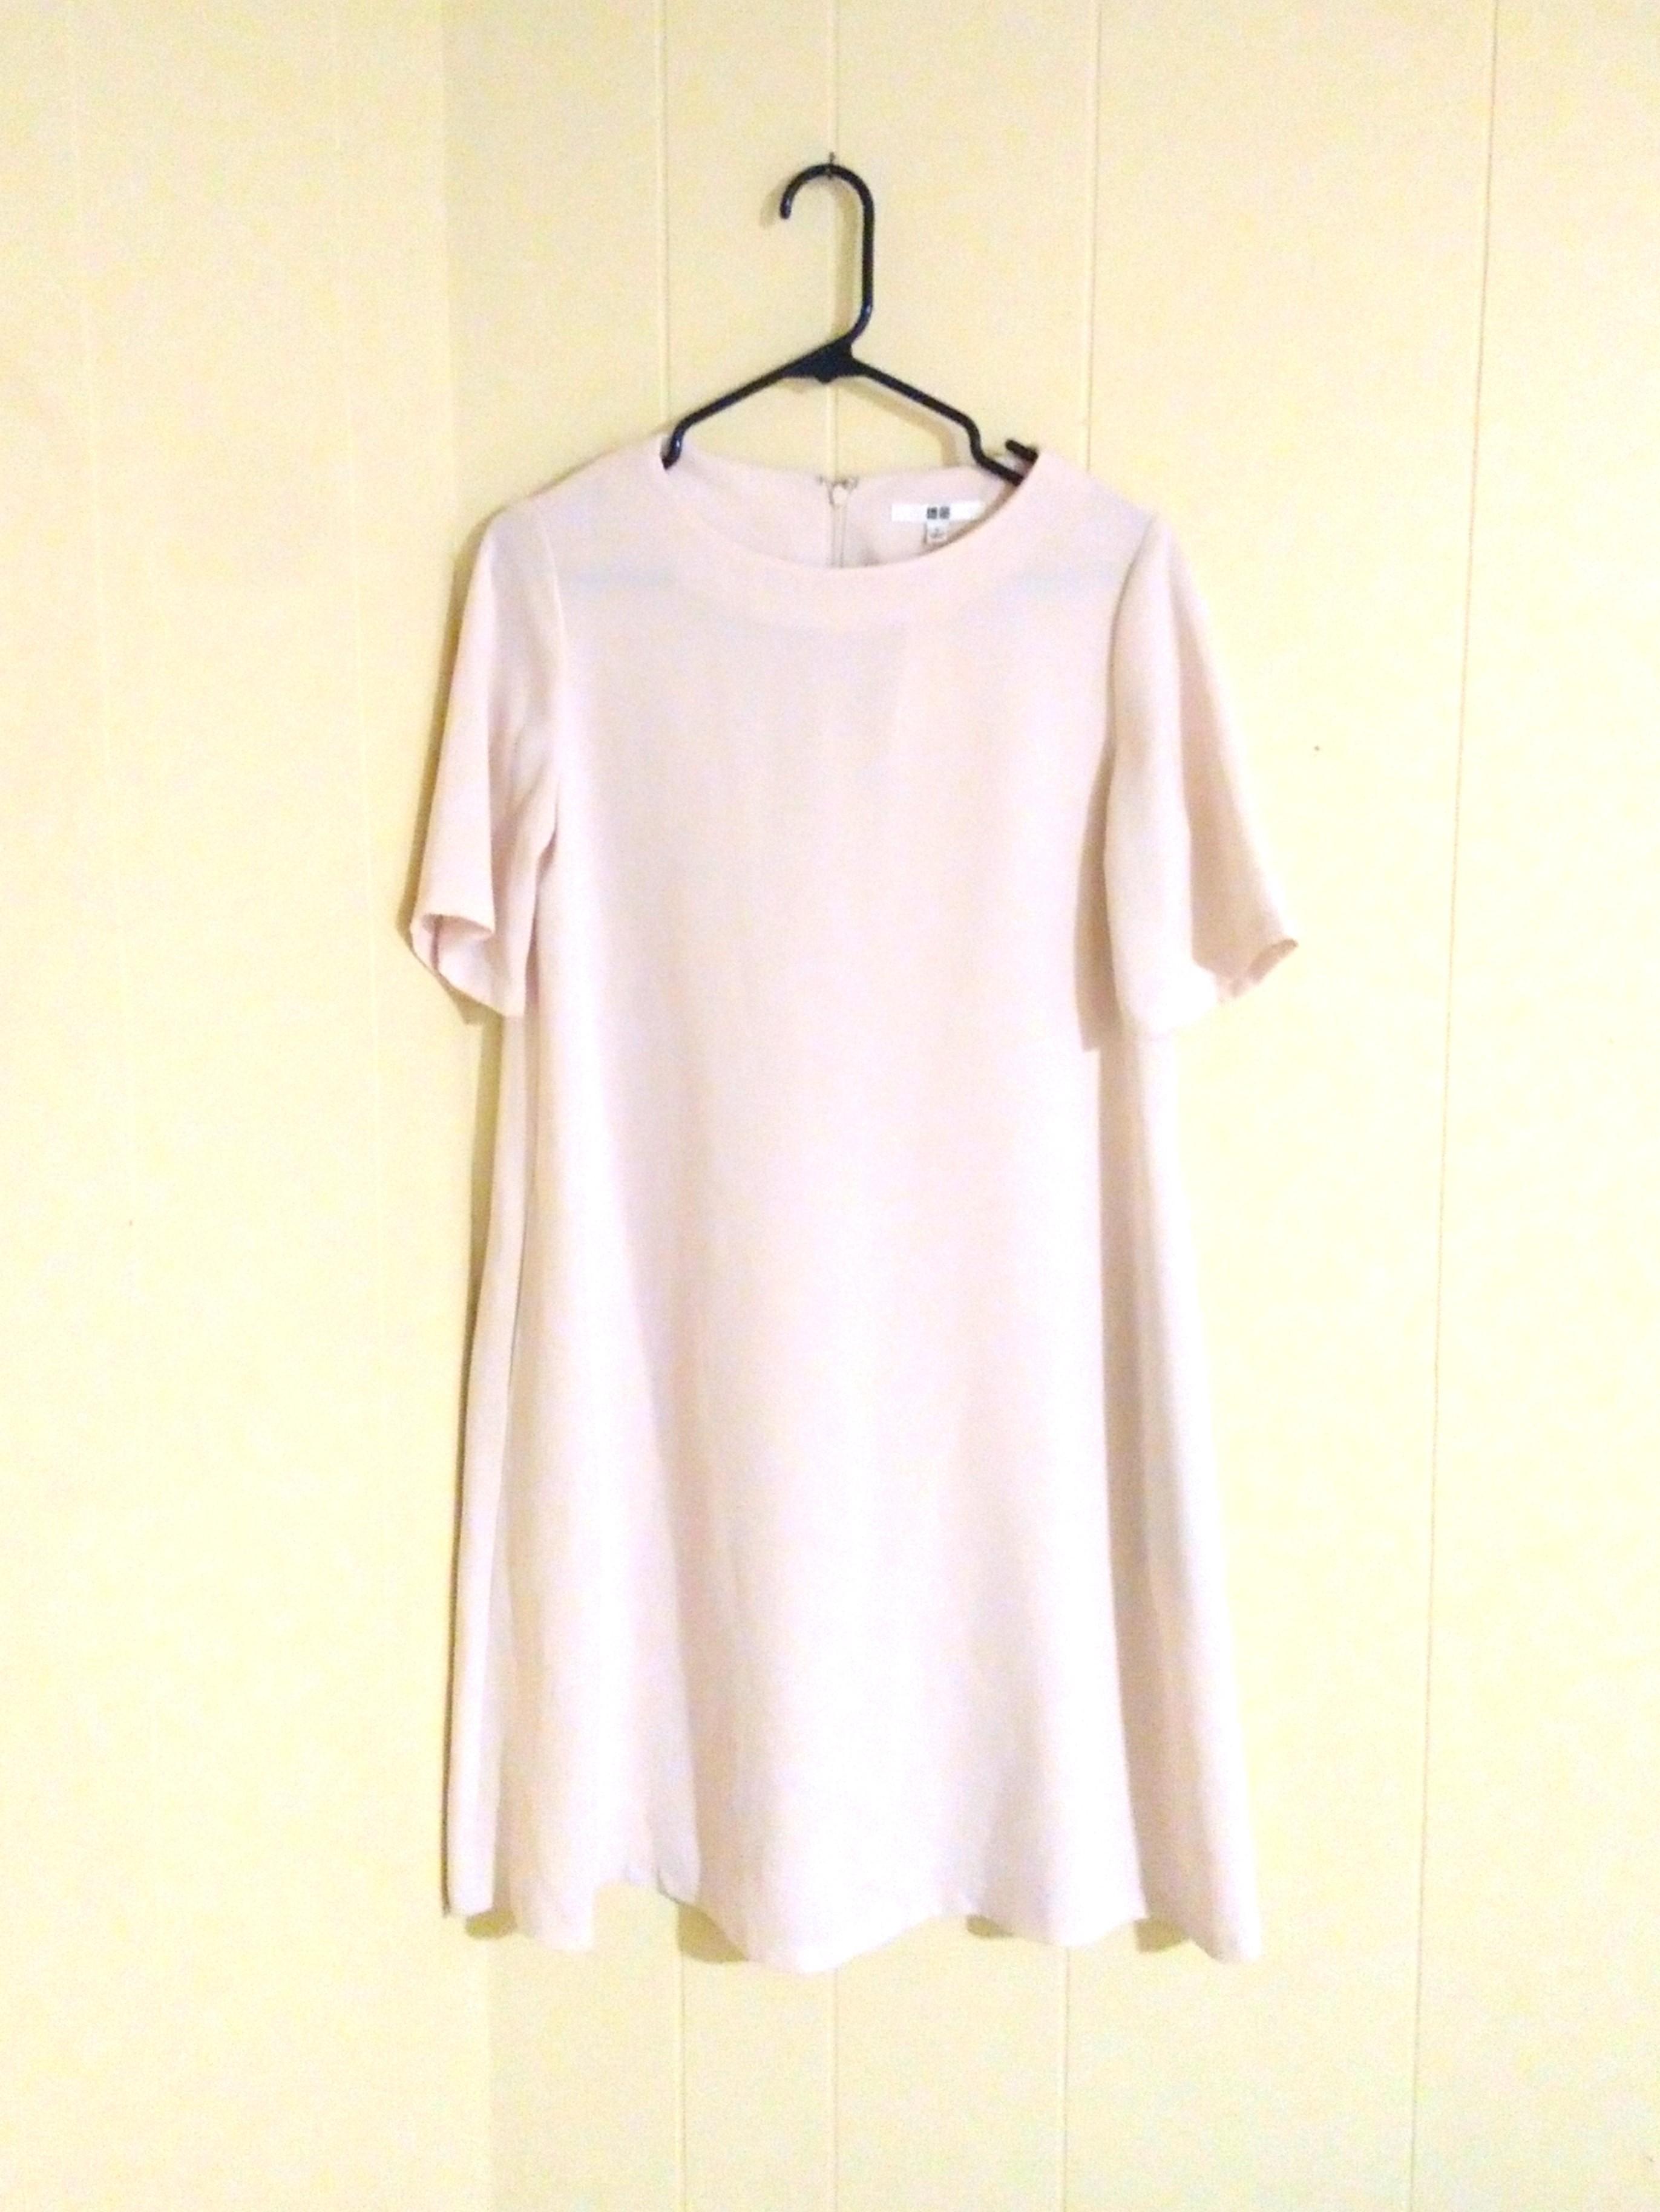 BNWT short sleeve dress uniqlo